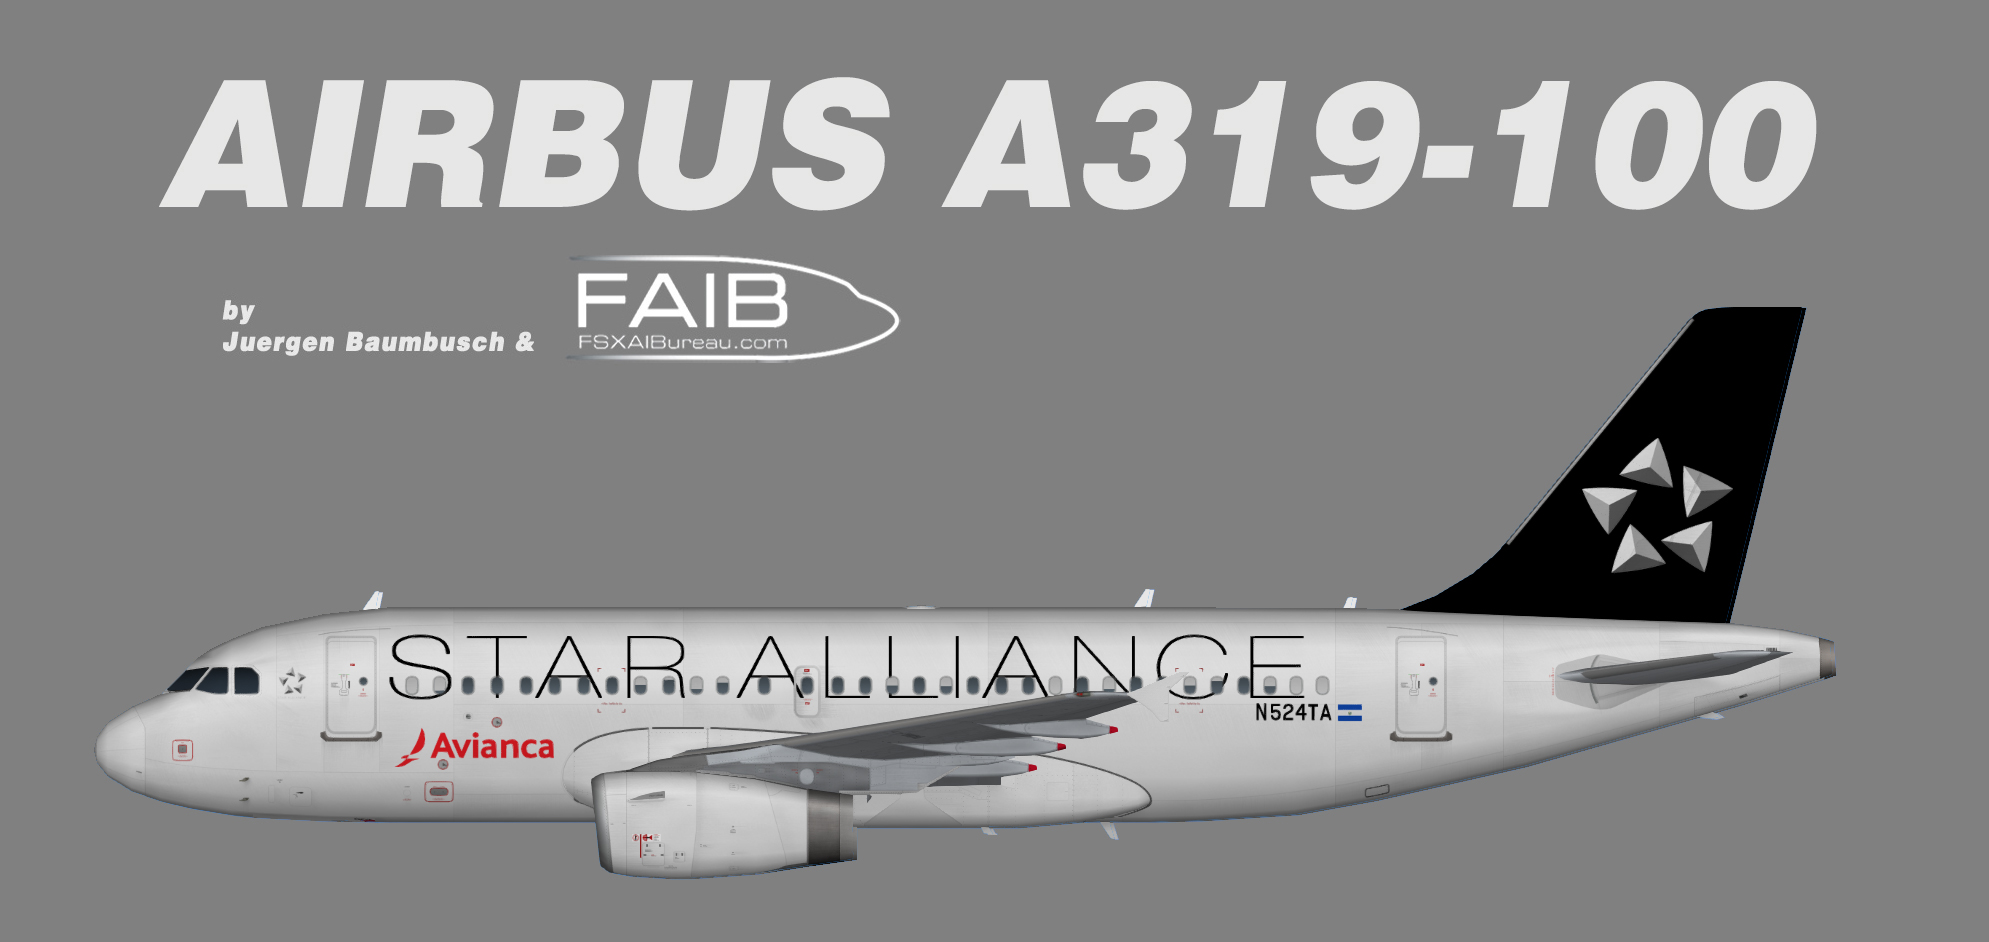 Avianca El Salvador Airbus A319 Star Alliance